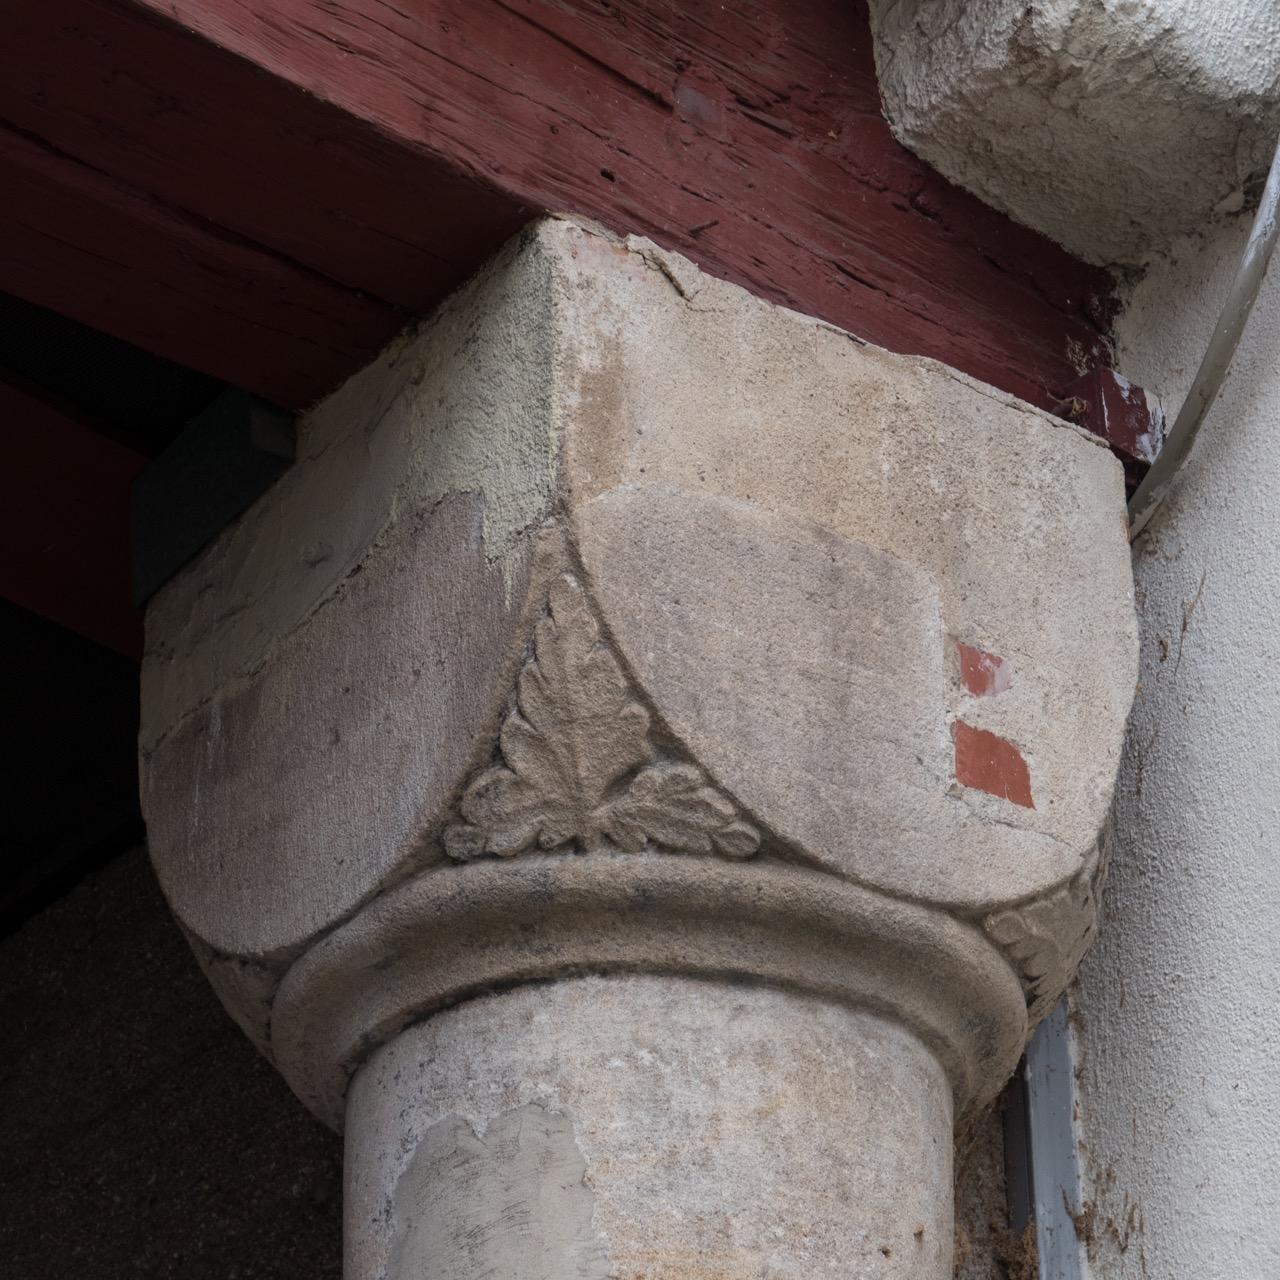 Romanische Säule im Spitalhof, Würfelkapitell